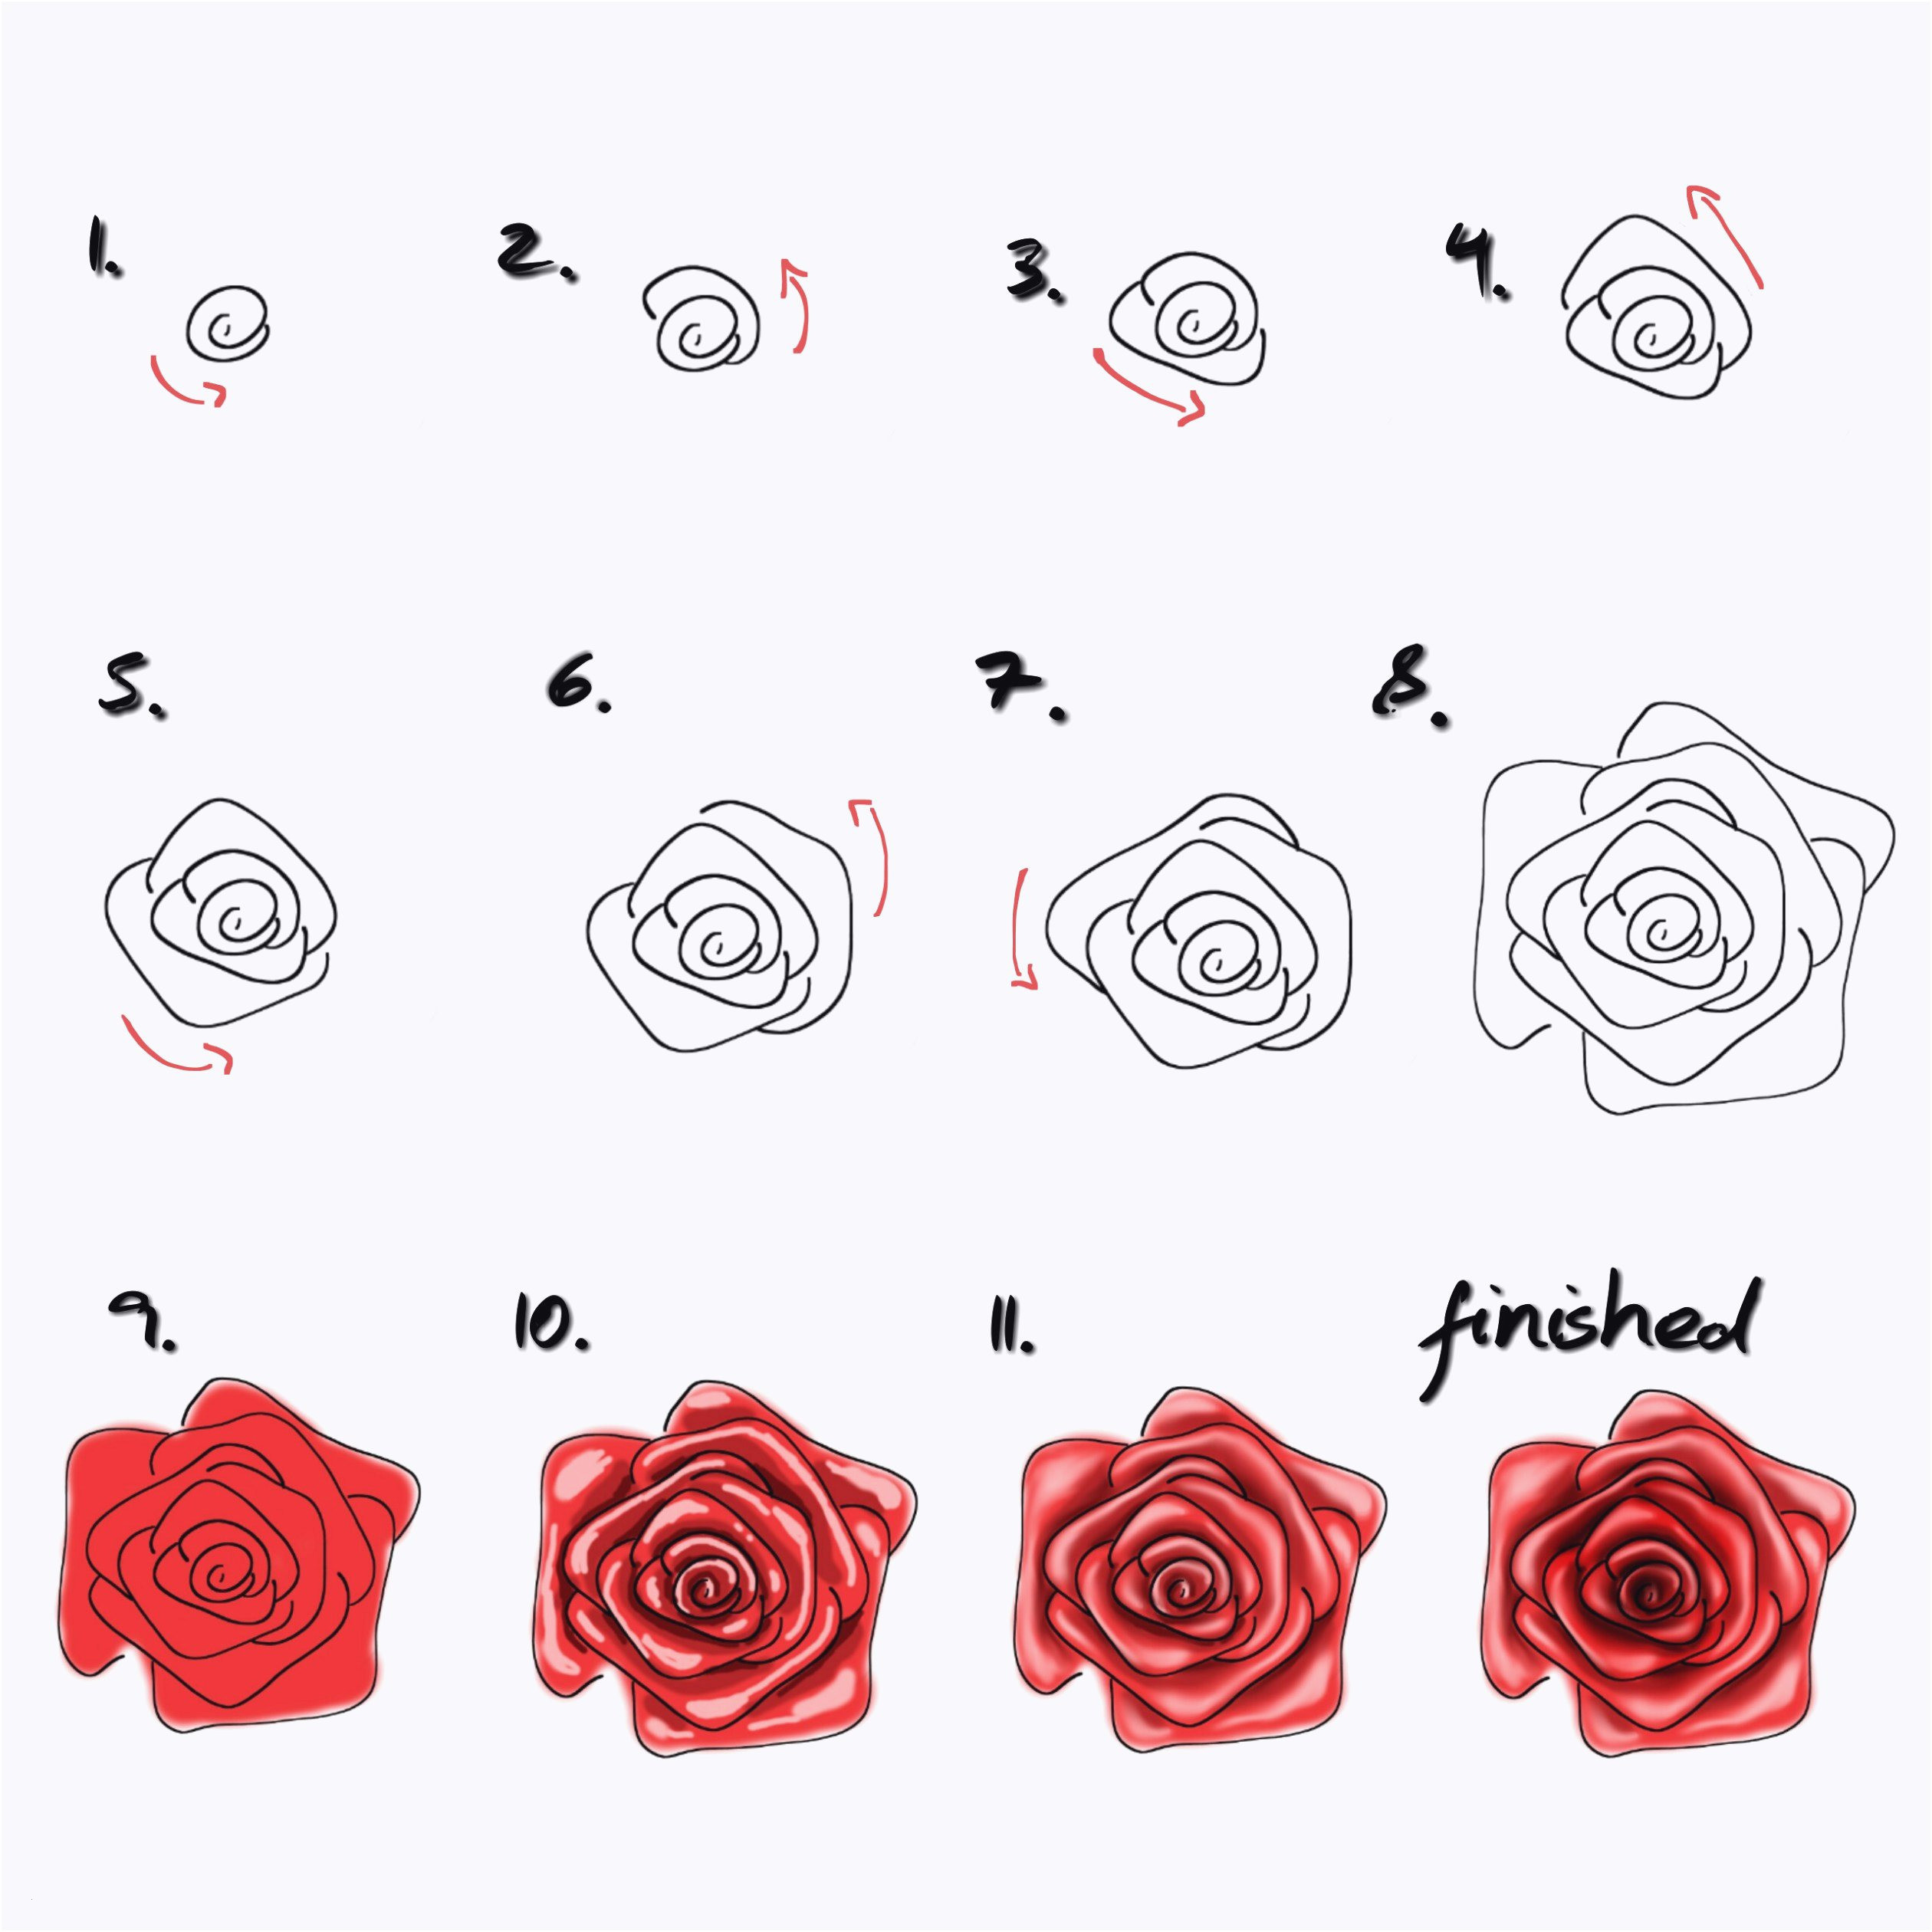 Mandala Zum Ausdrucken Rosen Frisch 35 Rosen Malvorlagen Scoredatscore Genial Ausmalbilder Mandala Rosen Bilder